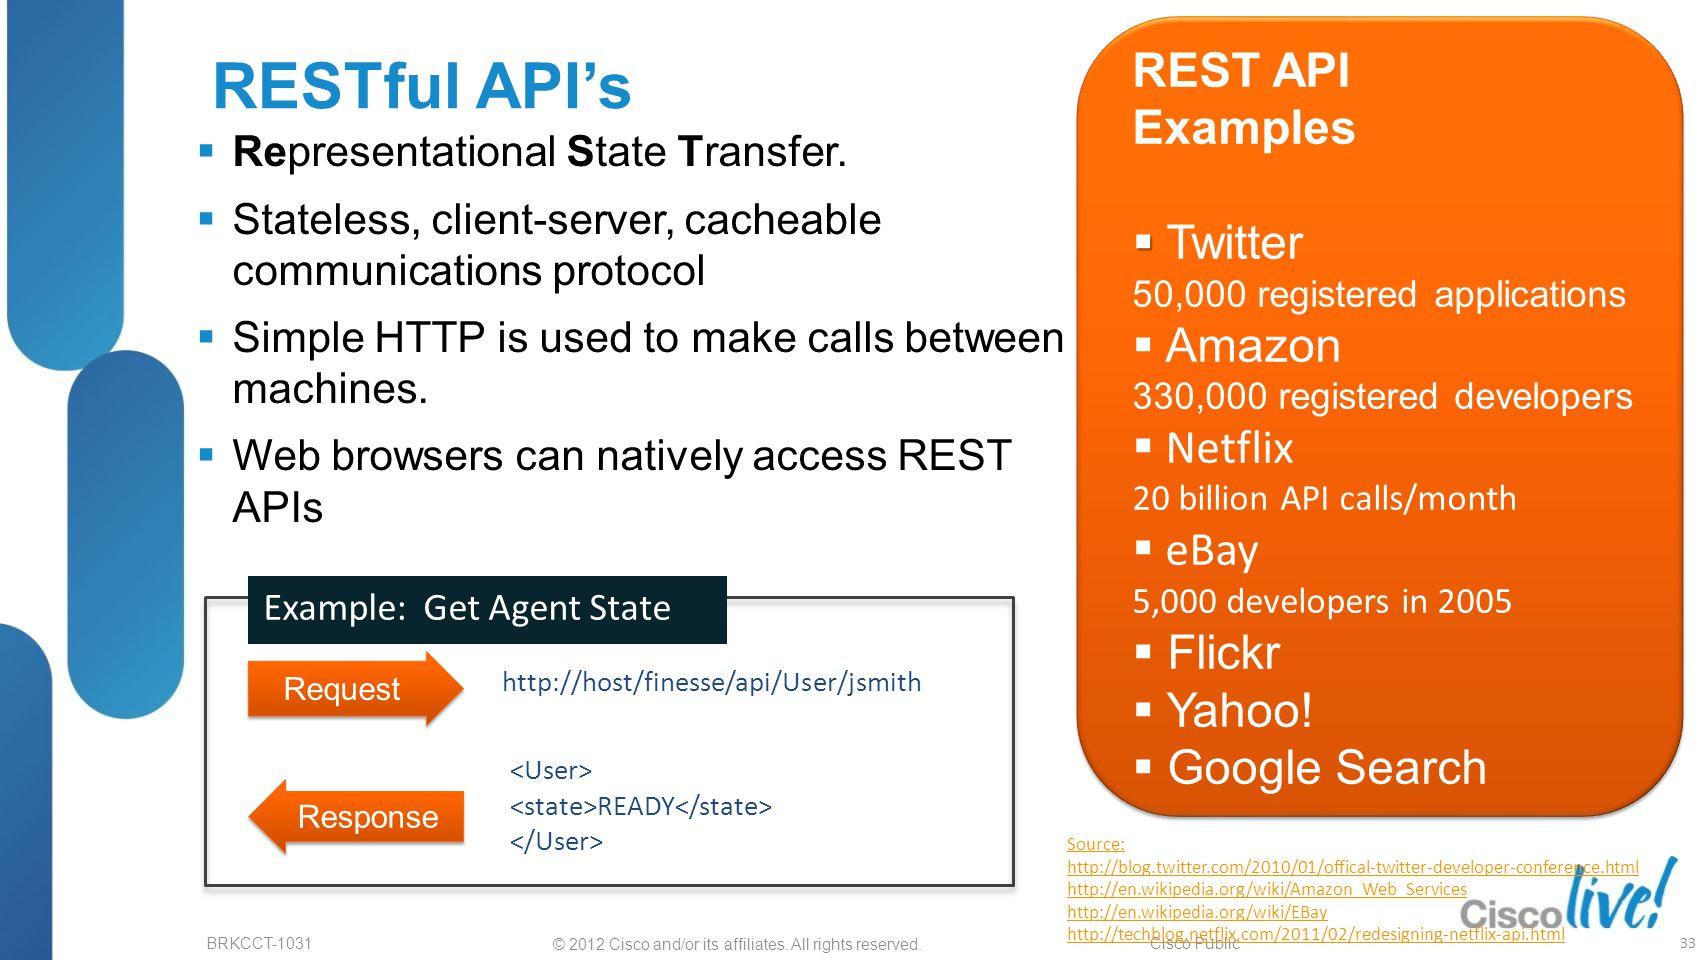 RESTful API's REST API Examples Twitter Amazon Netflix eBay Flickr